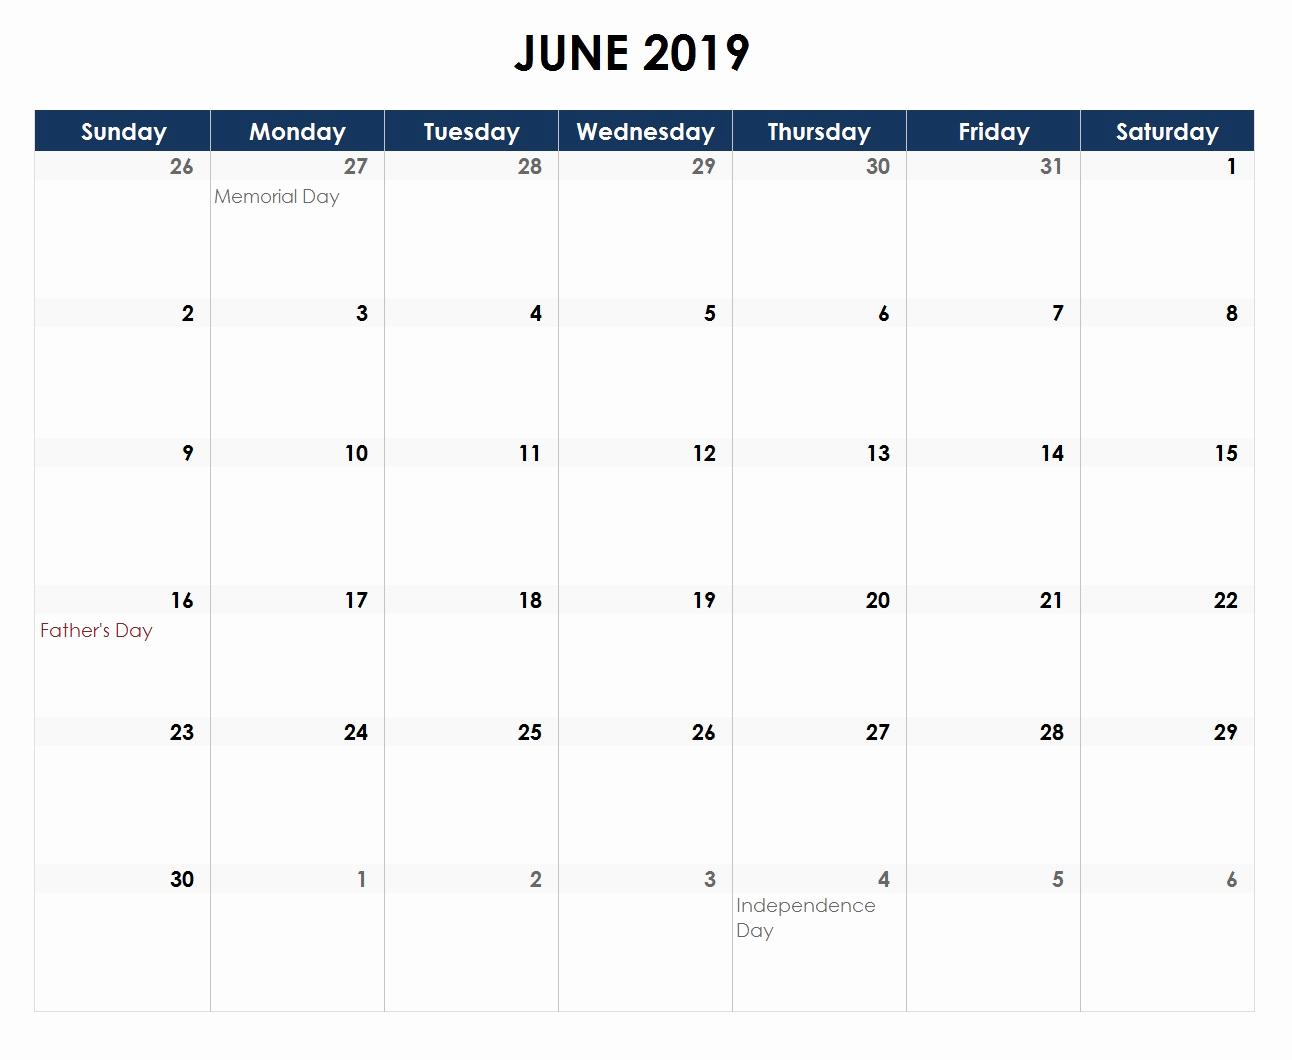 Excel Calendar 2019 Template Beautiful June 2019 Calendar Excel